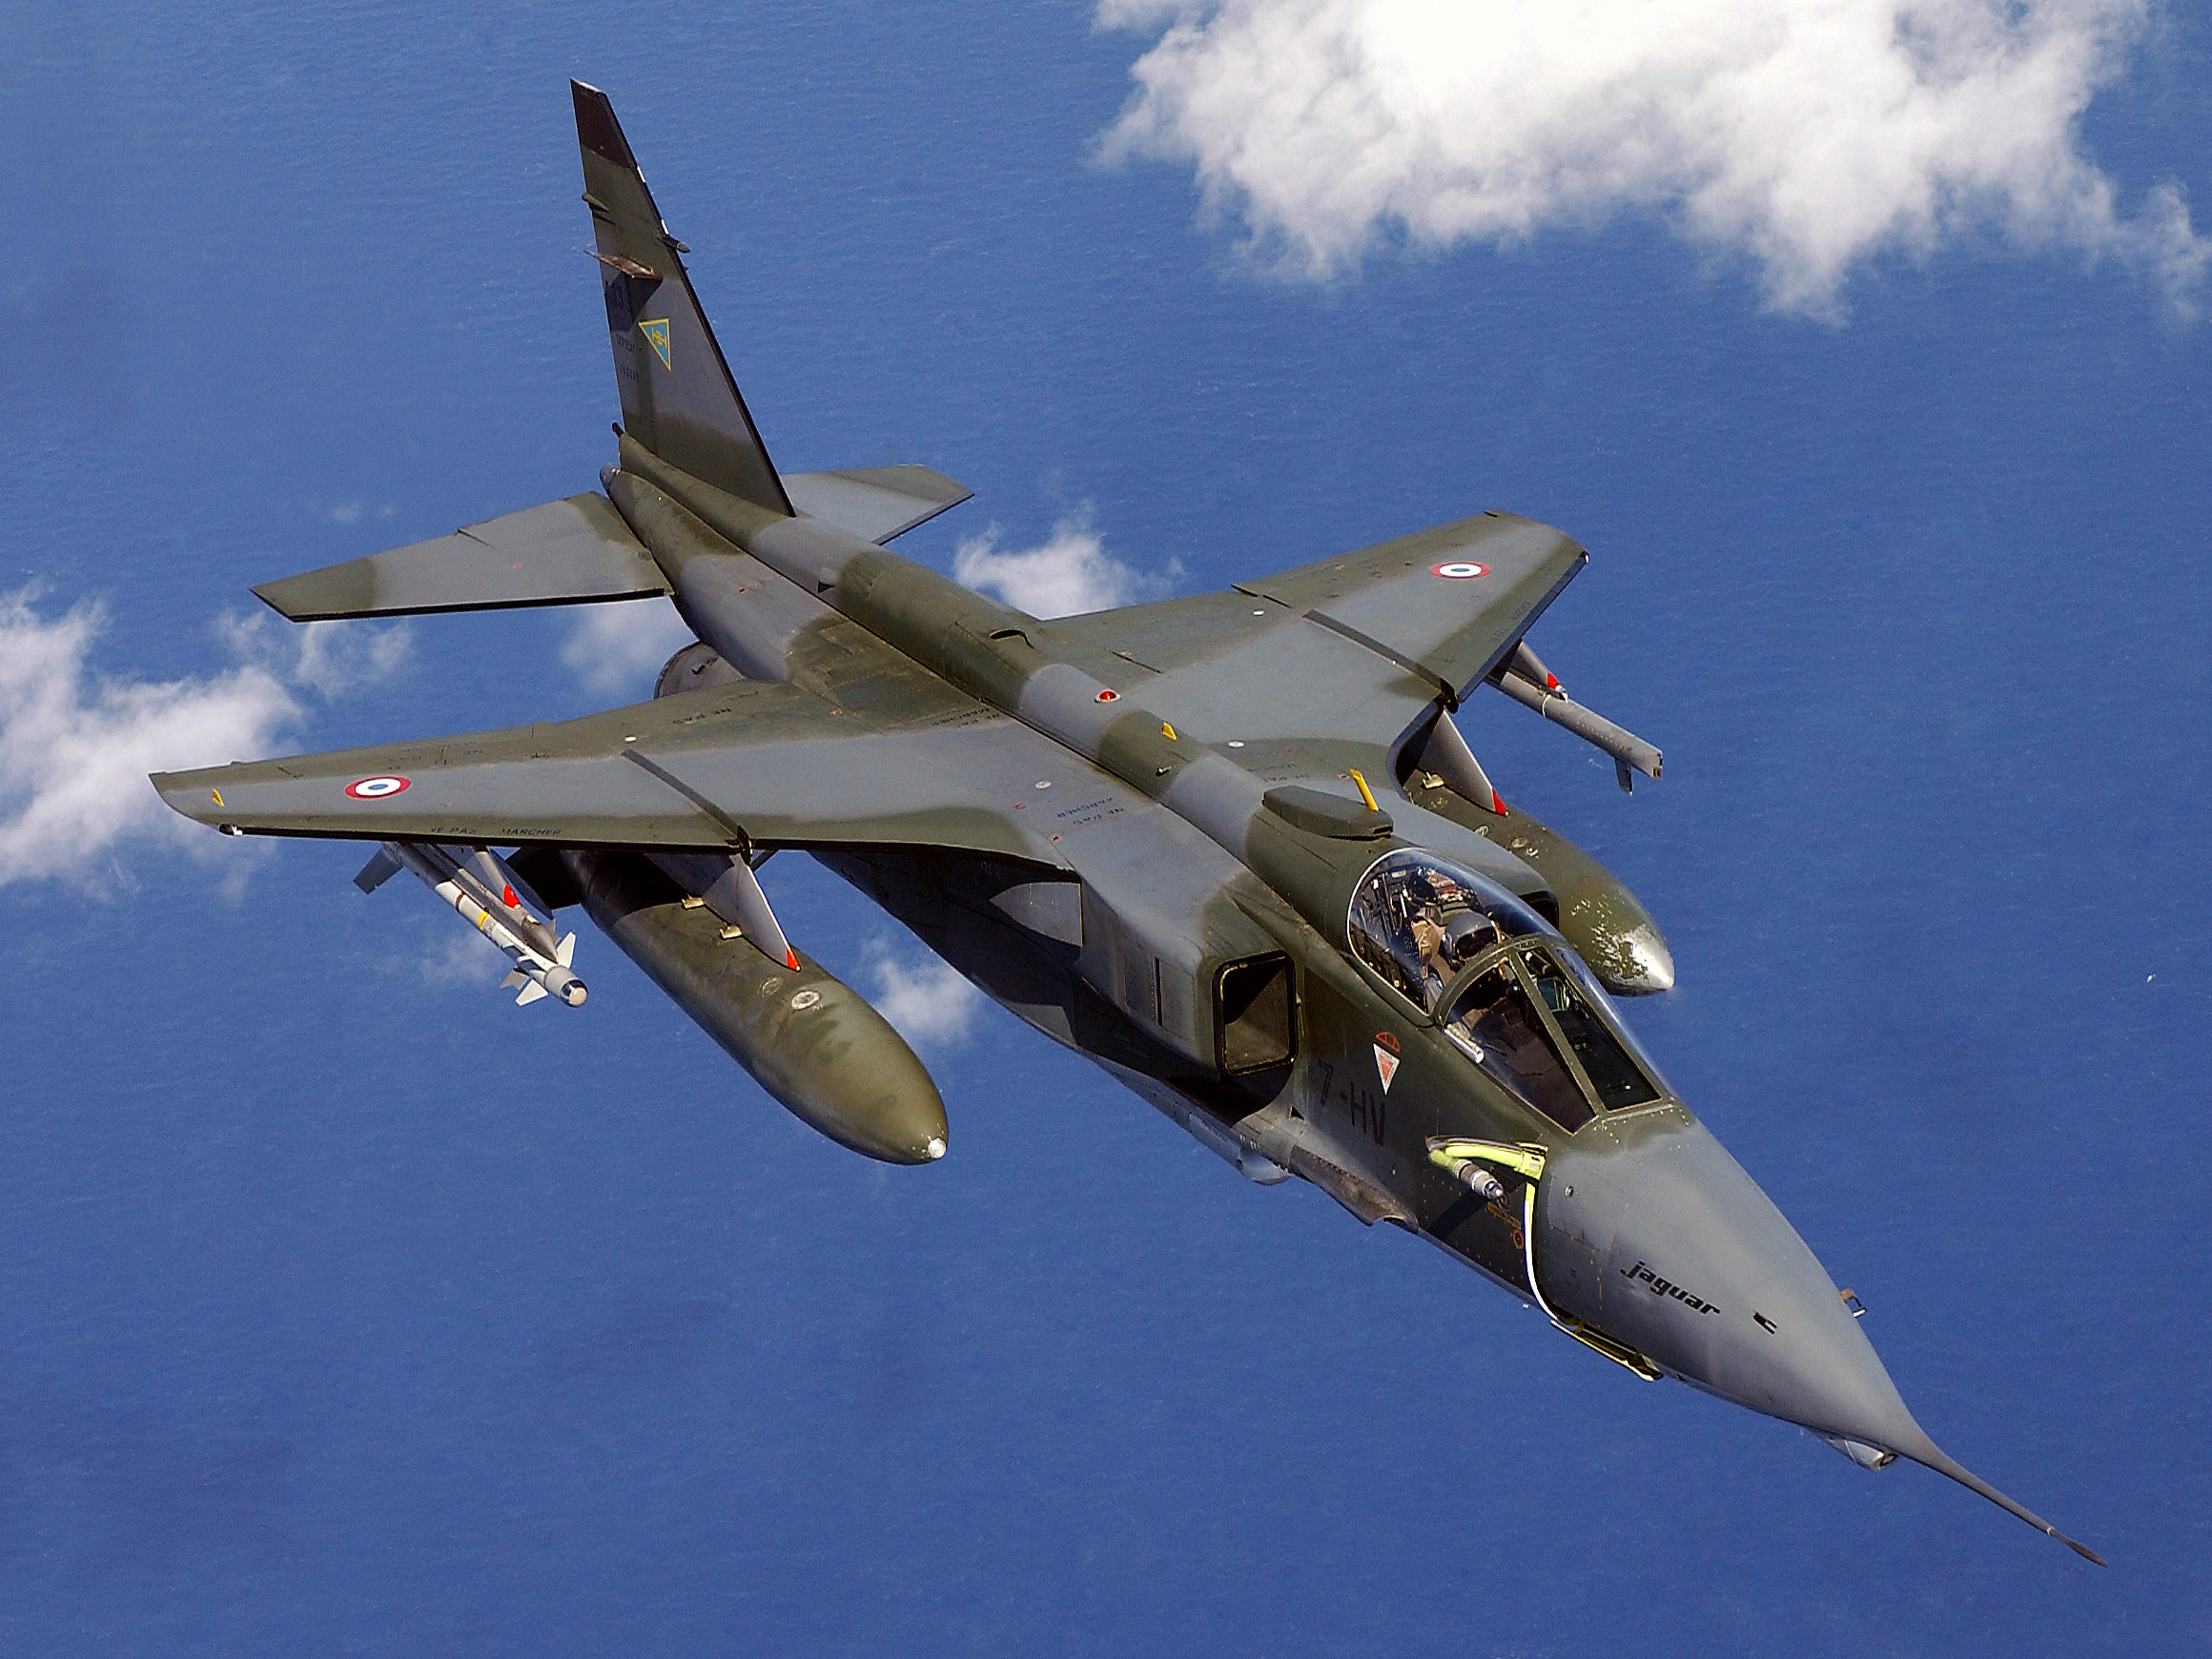 https://i2.wp.com/upload.wikimedia.org/wikipedia/commons/7/71/Jaguar_DF-SD-05-05511.JPEG